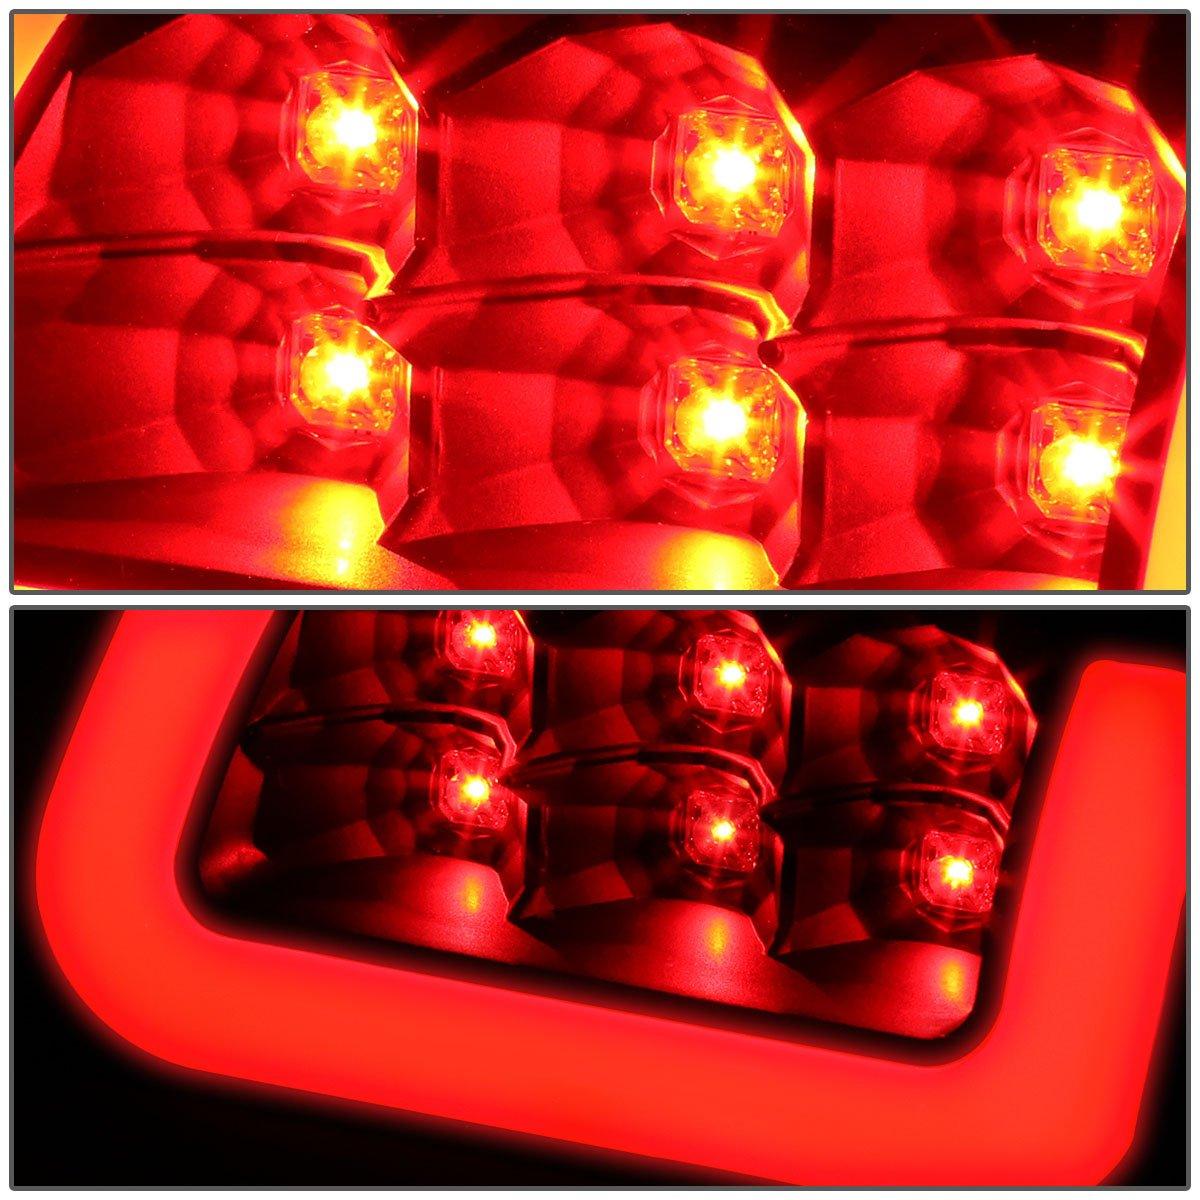 DNA Motoring TL-DRAM94-LED-3D-BK-CL Tail Light Driver /& Passenger Side